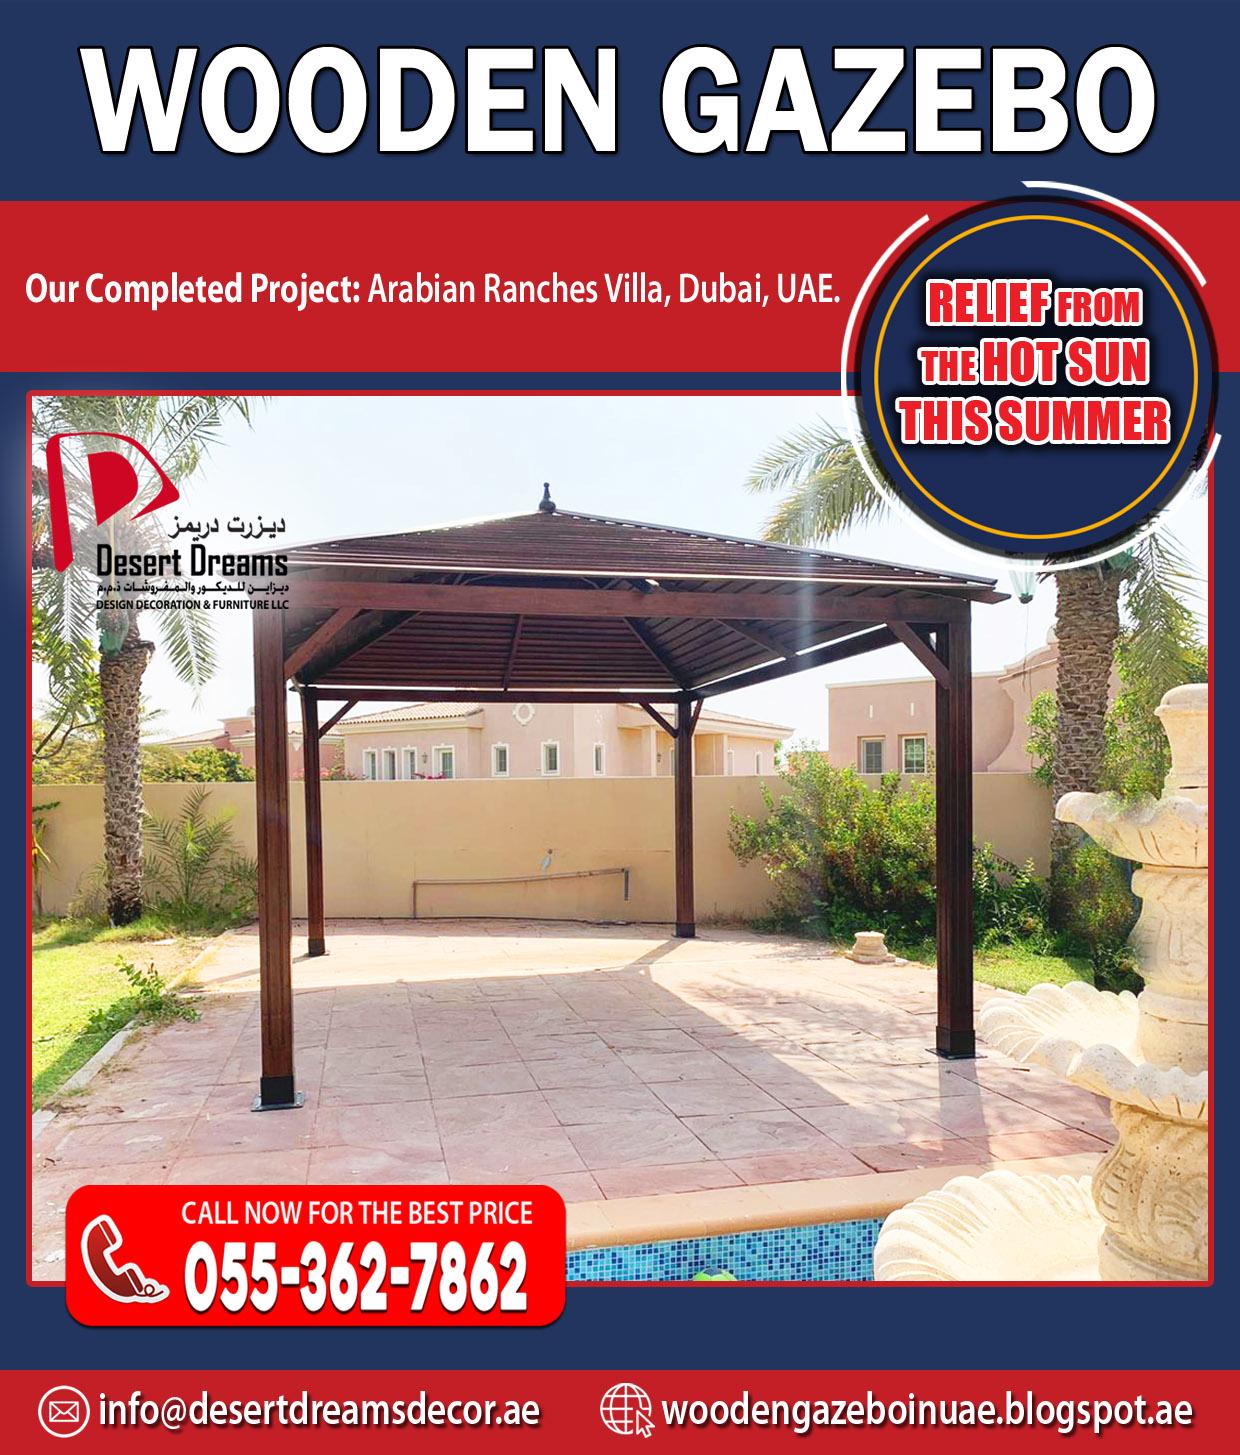 Wooden Gazebo in Dubai, UAE-3.jpg